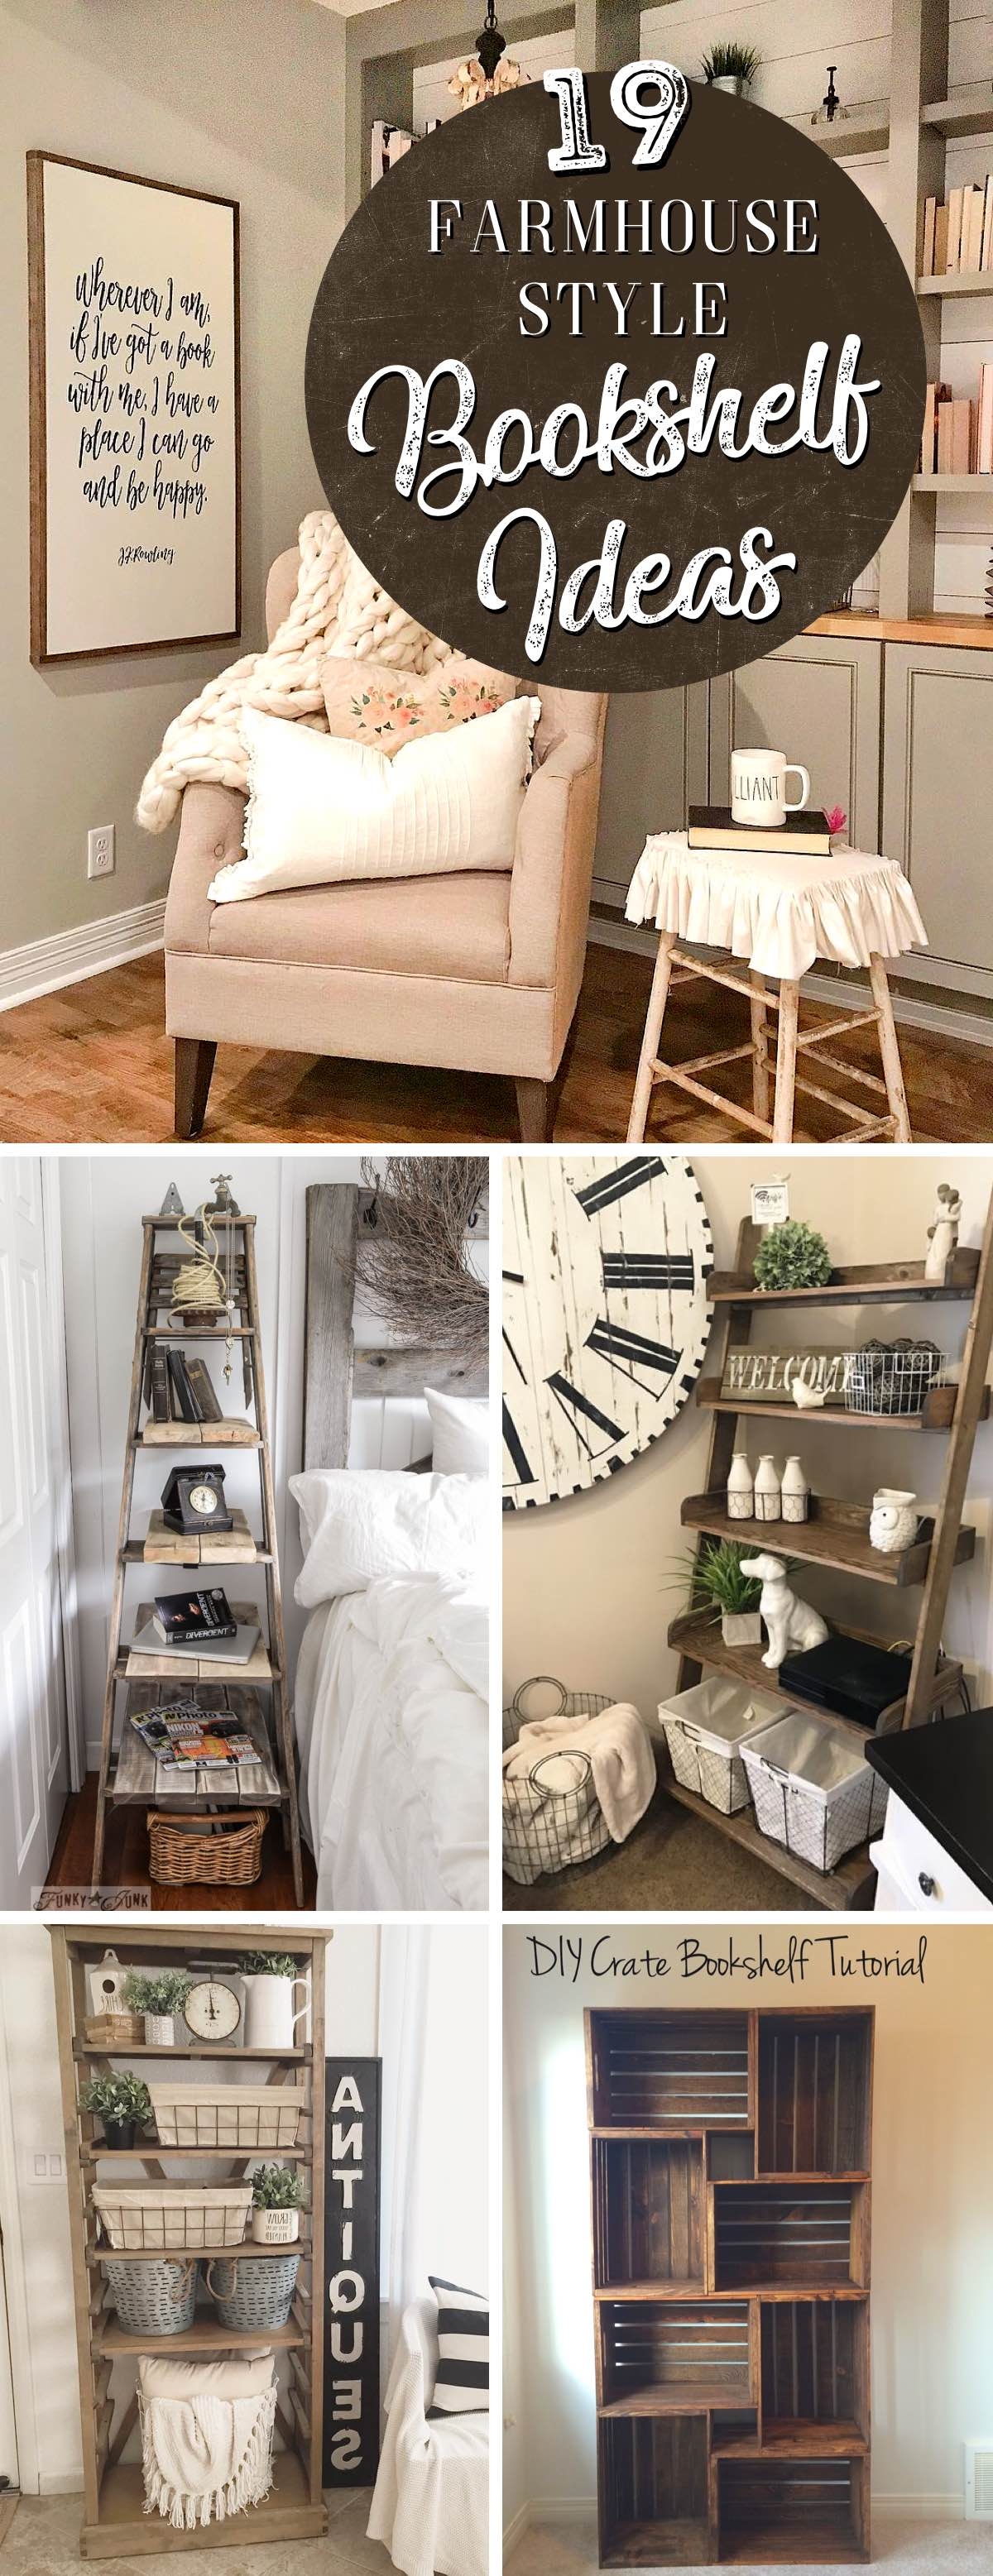 Practical Farmhouse Style Bookshelf Ideas